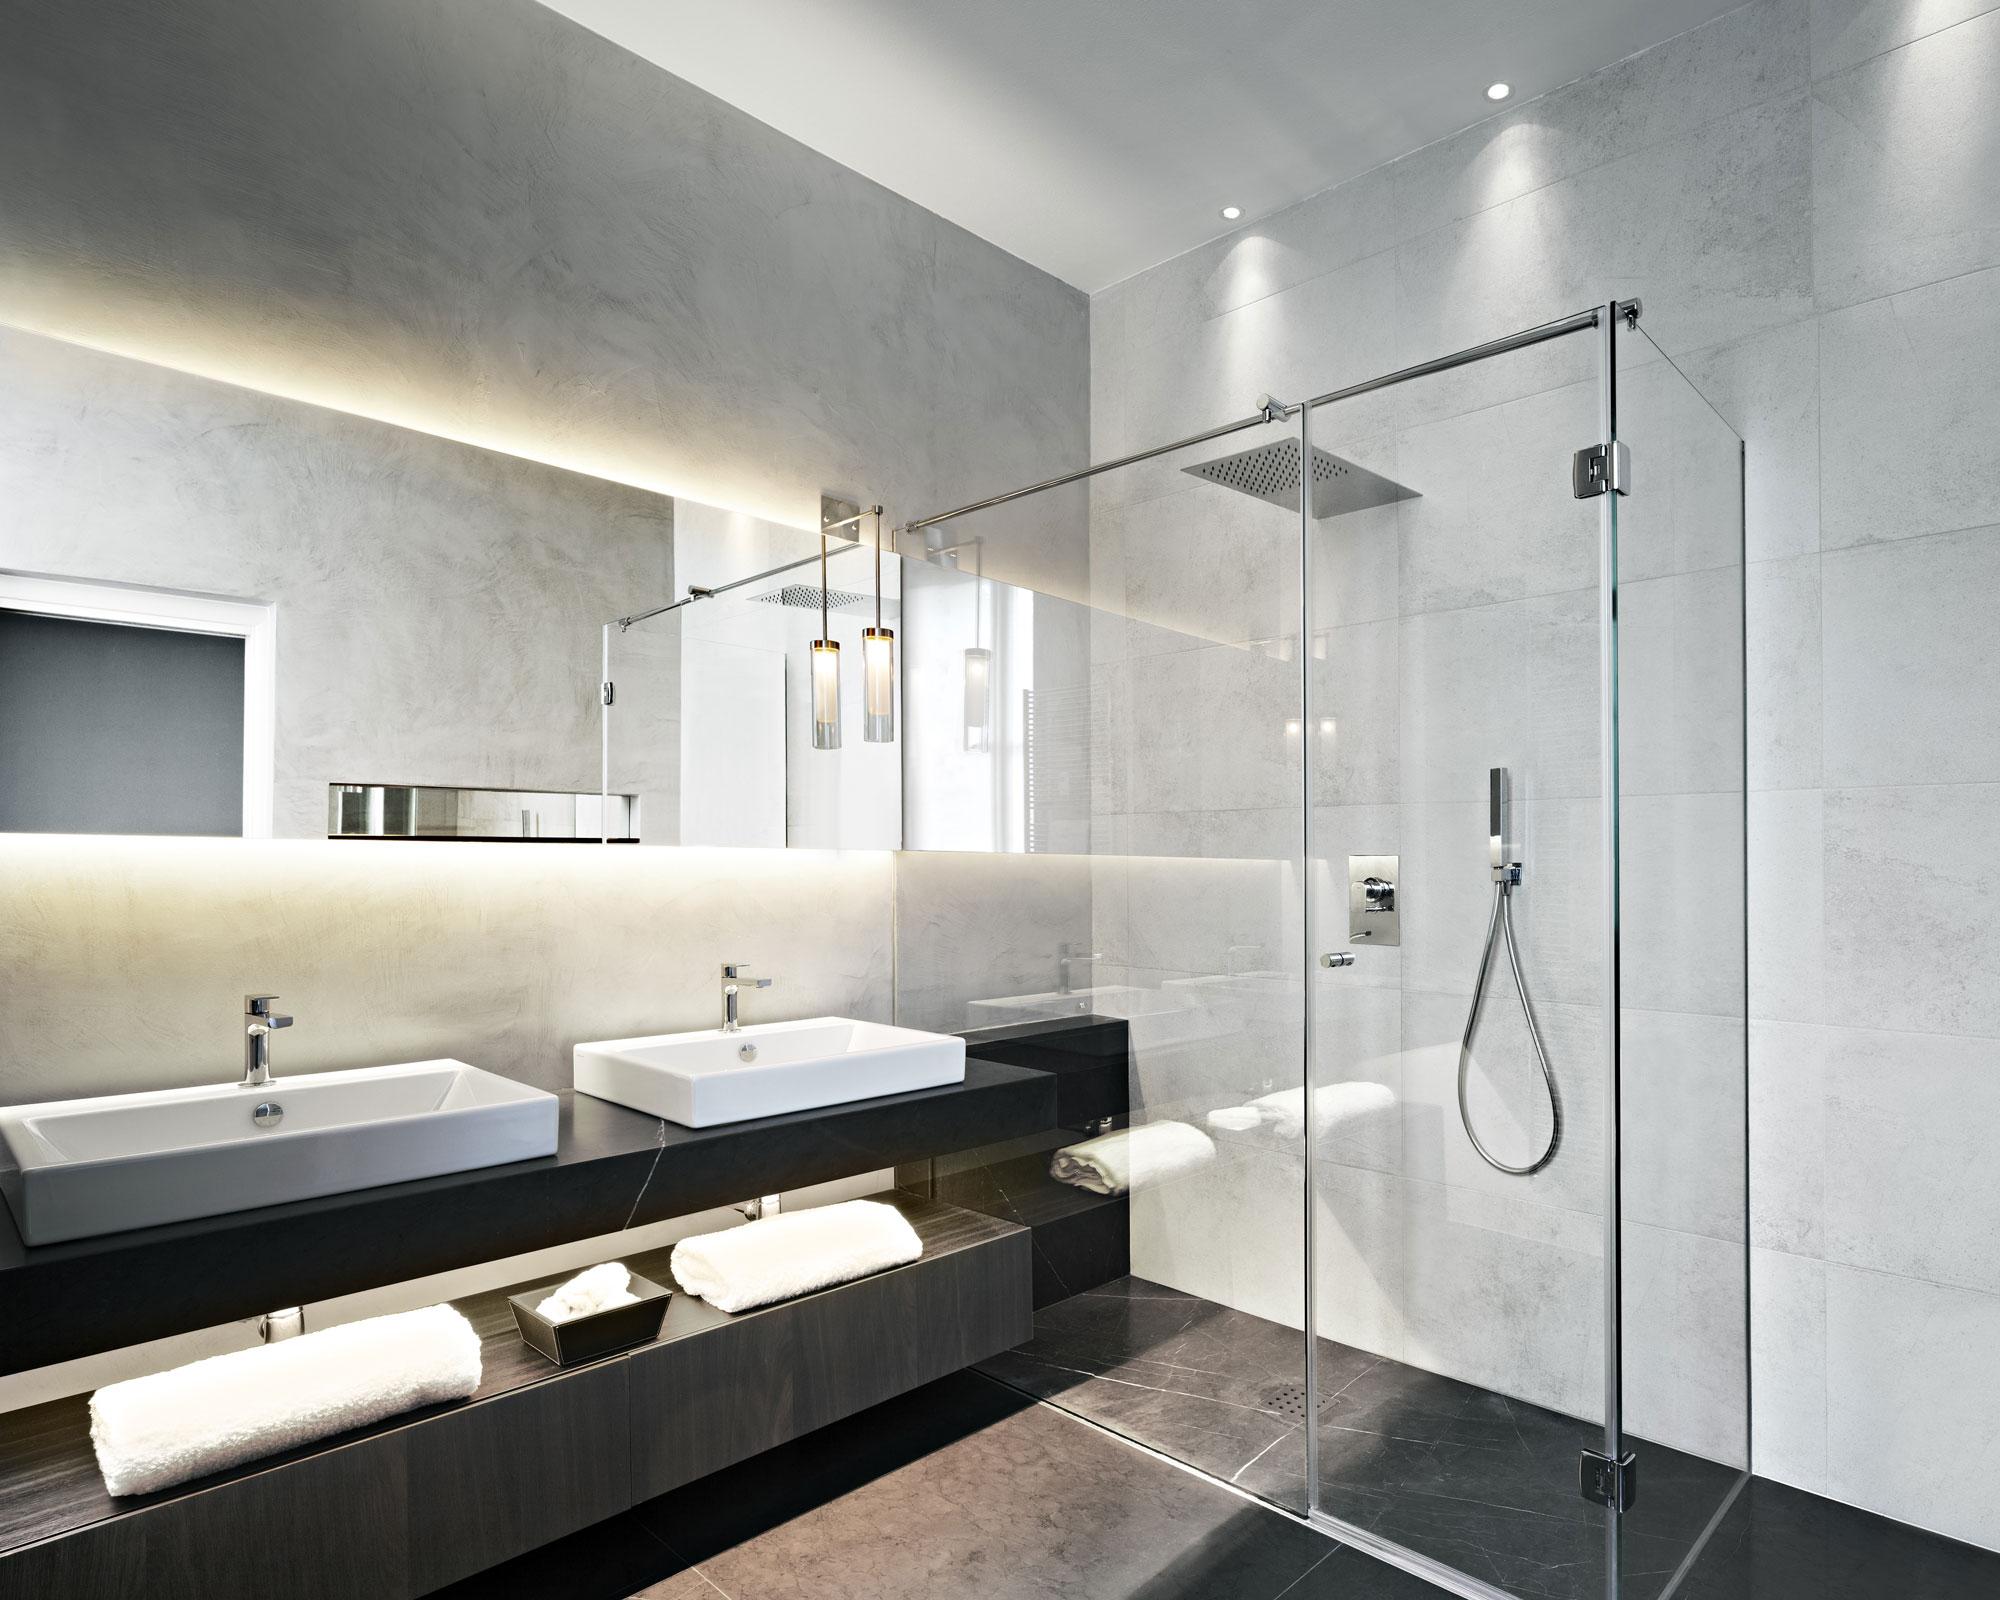 Led bathroom lamps beautifully?